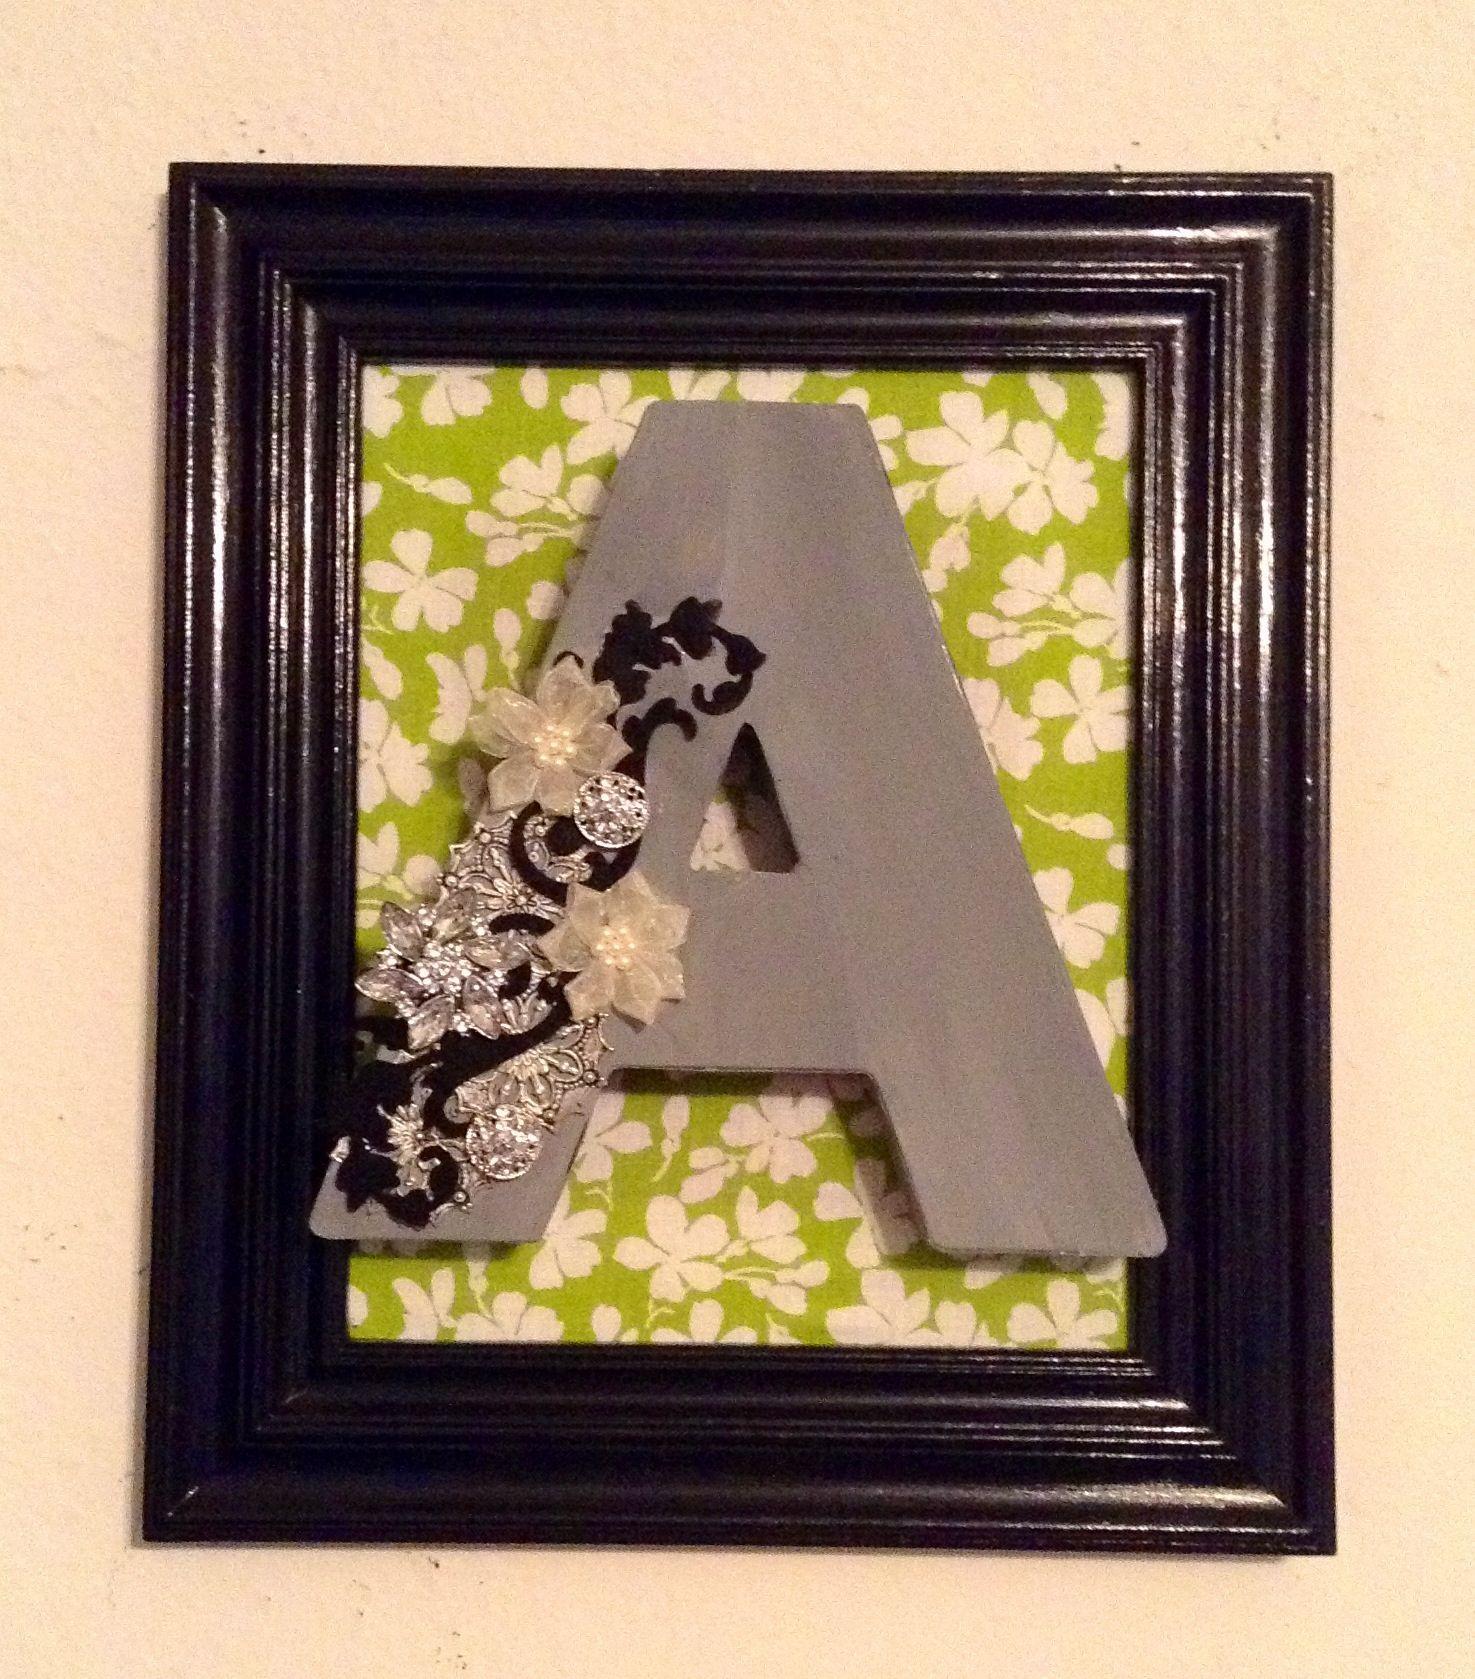 A decorated letter diy wall art diy wall art diy